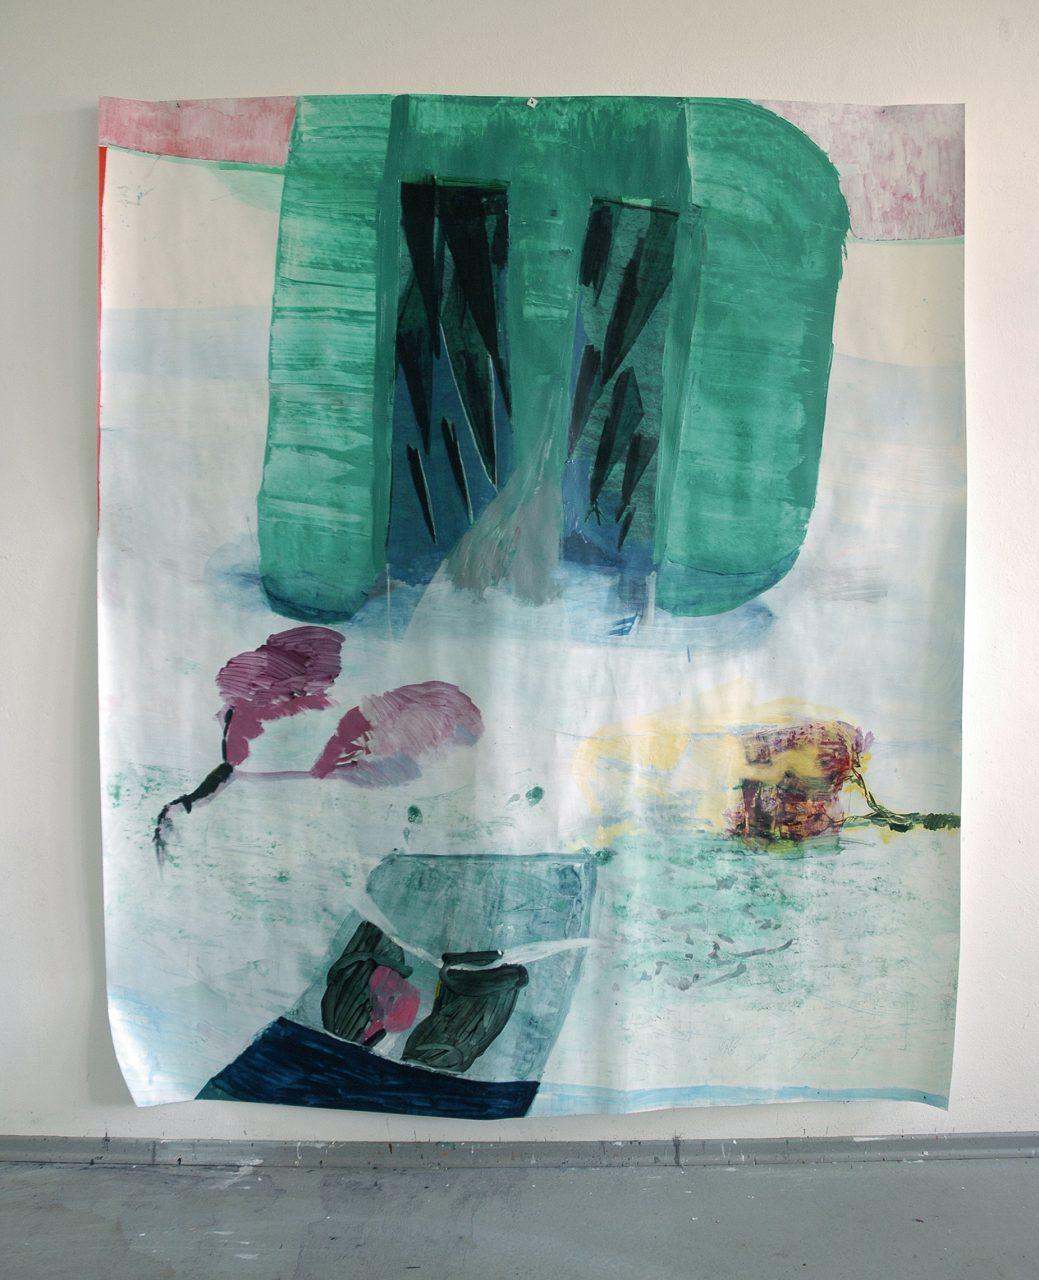 sprang in einen Fluss, 2014, mixed media on paper, 255 x 250 cm